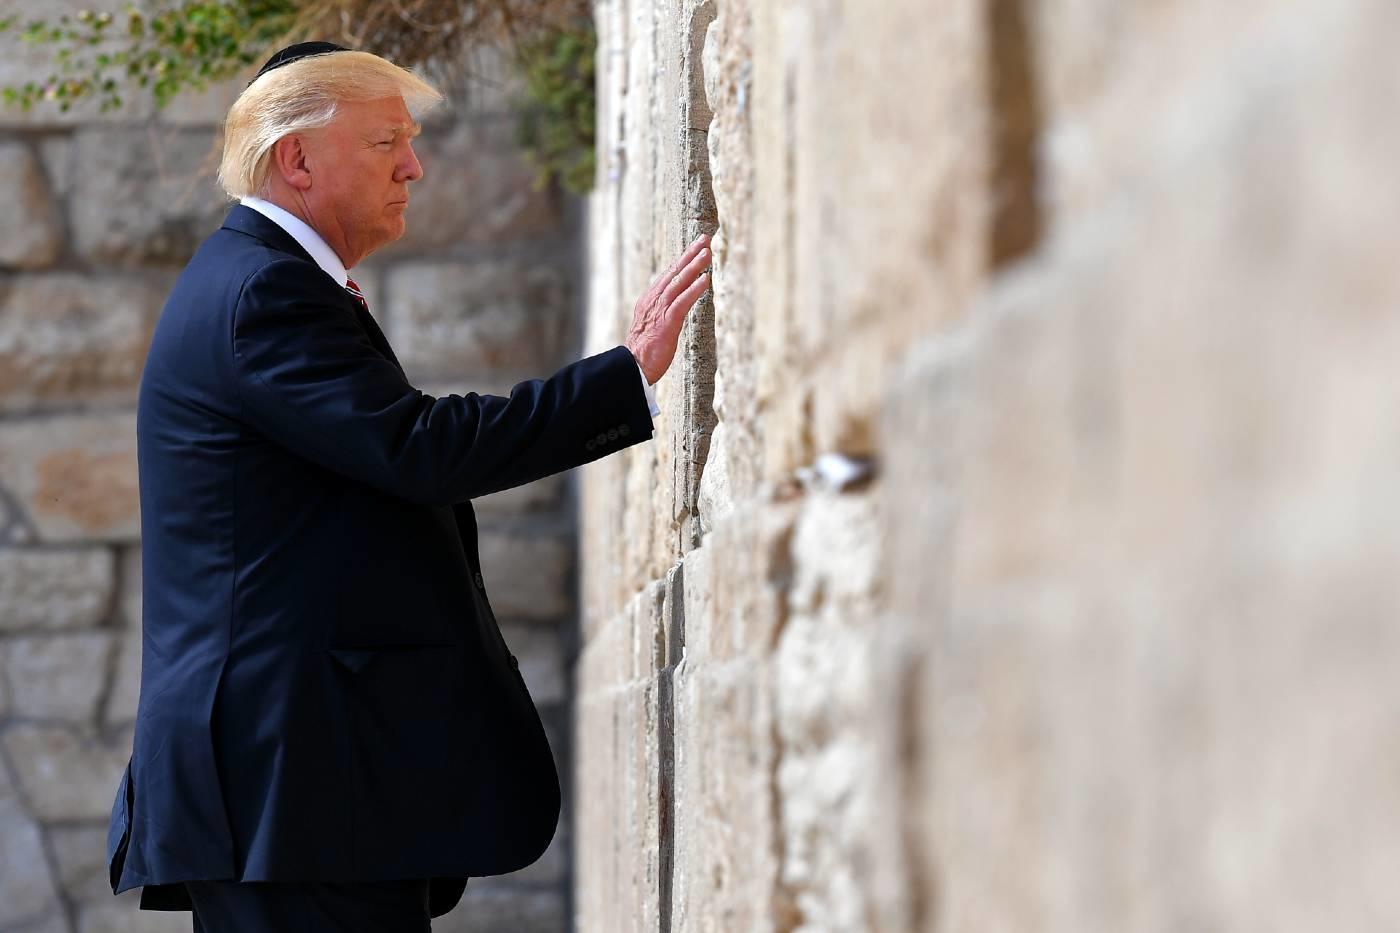 trump western wall jerusalem may 2017